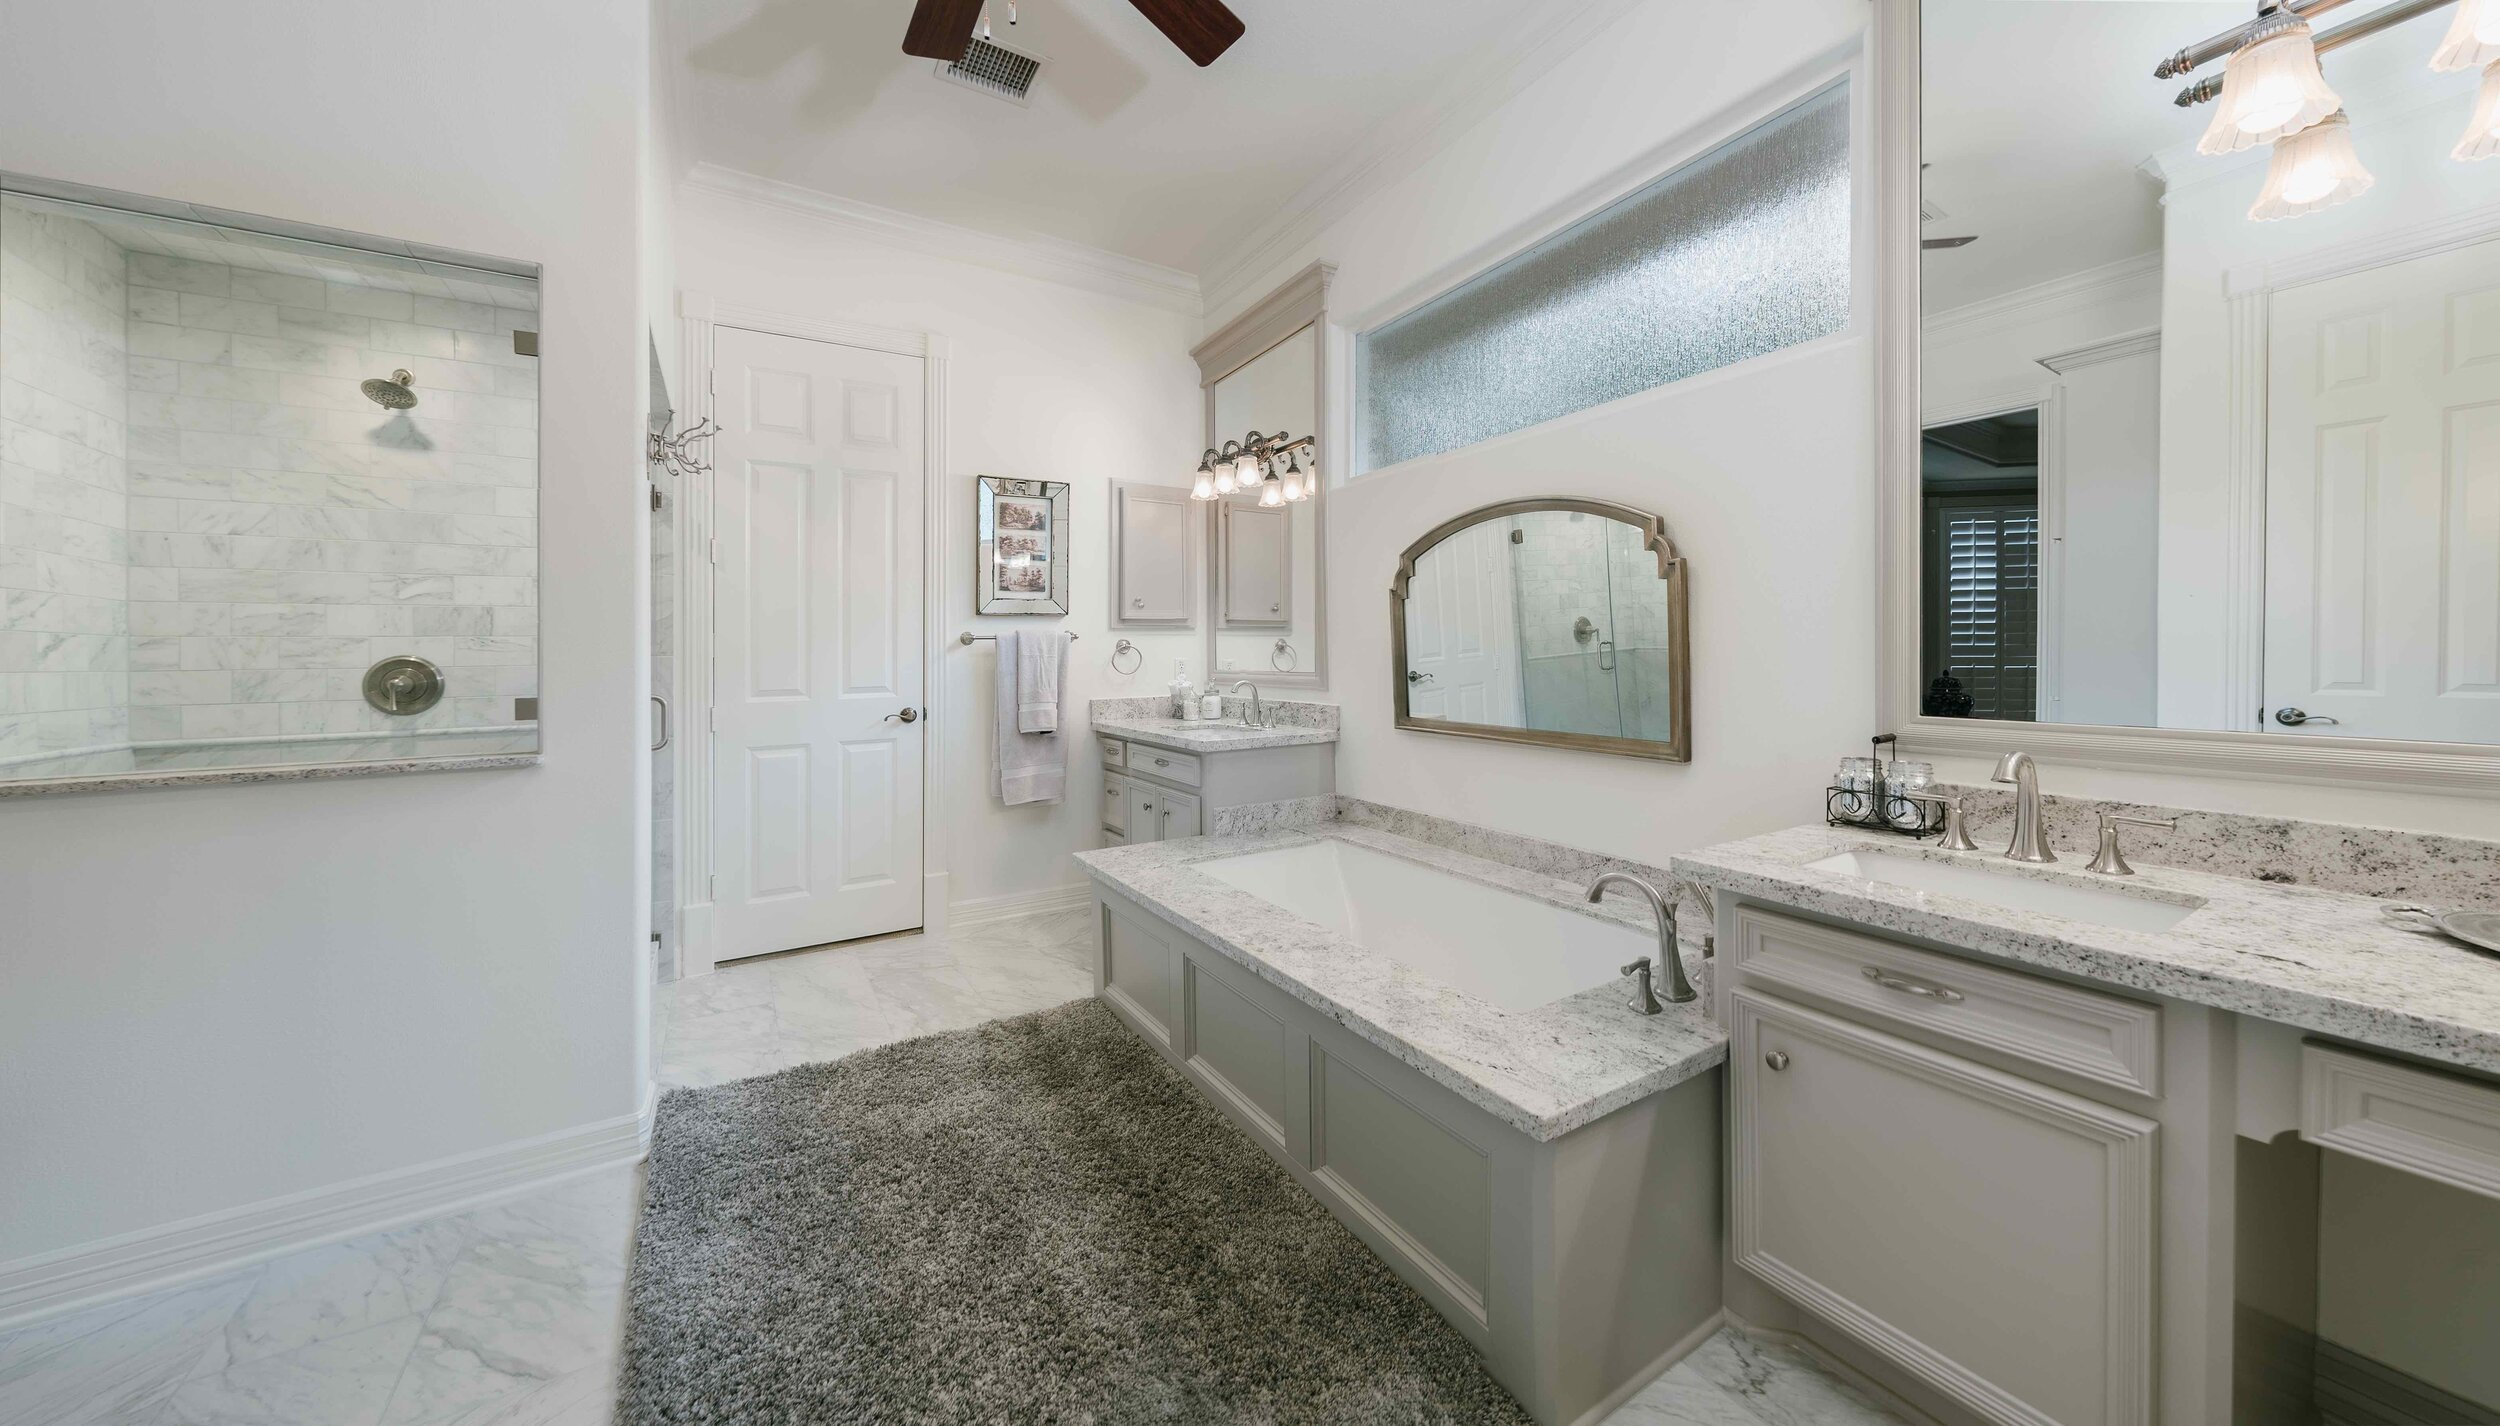 Carrara marble, grey carrara marble tile, master bathroom renovation, master bathroom remodel, farmhouse bathroom, grey bathroom inspiration, mirrors, walk-in shower, soaking tub, bathtub, vanity, his and hers vanities, walk in closet,